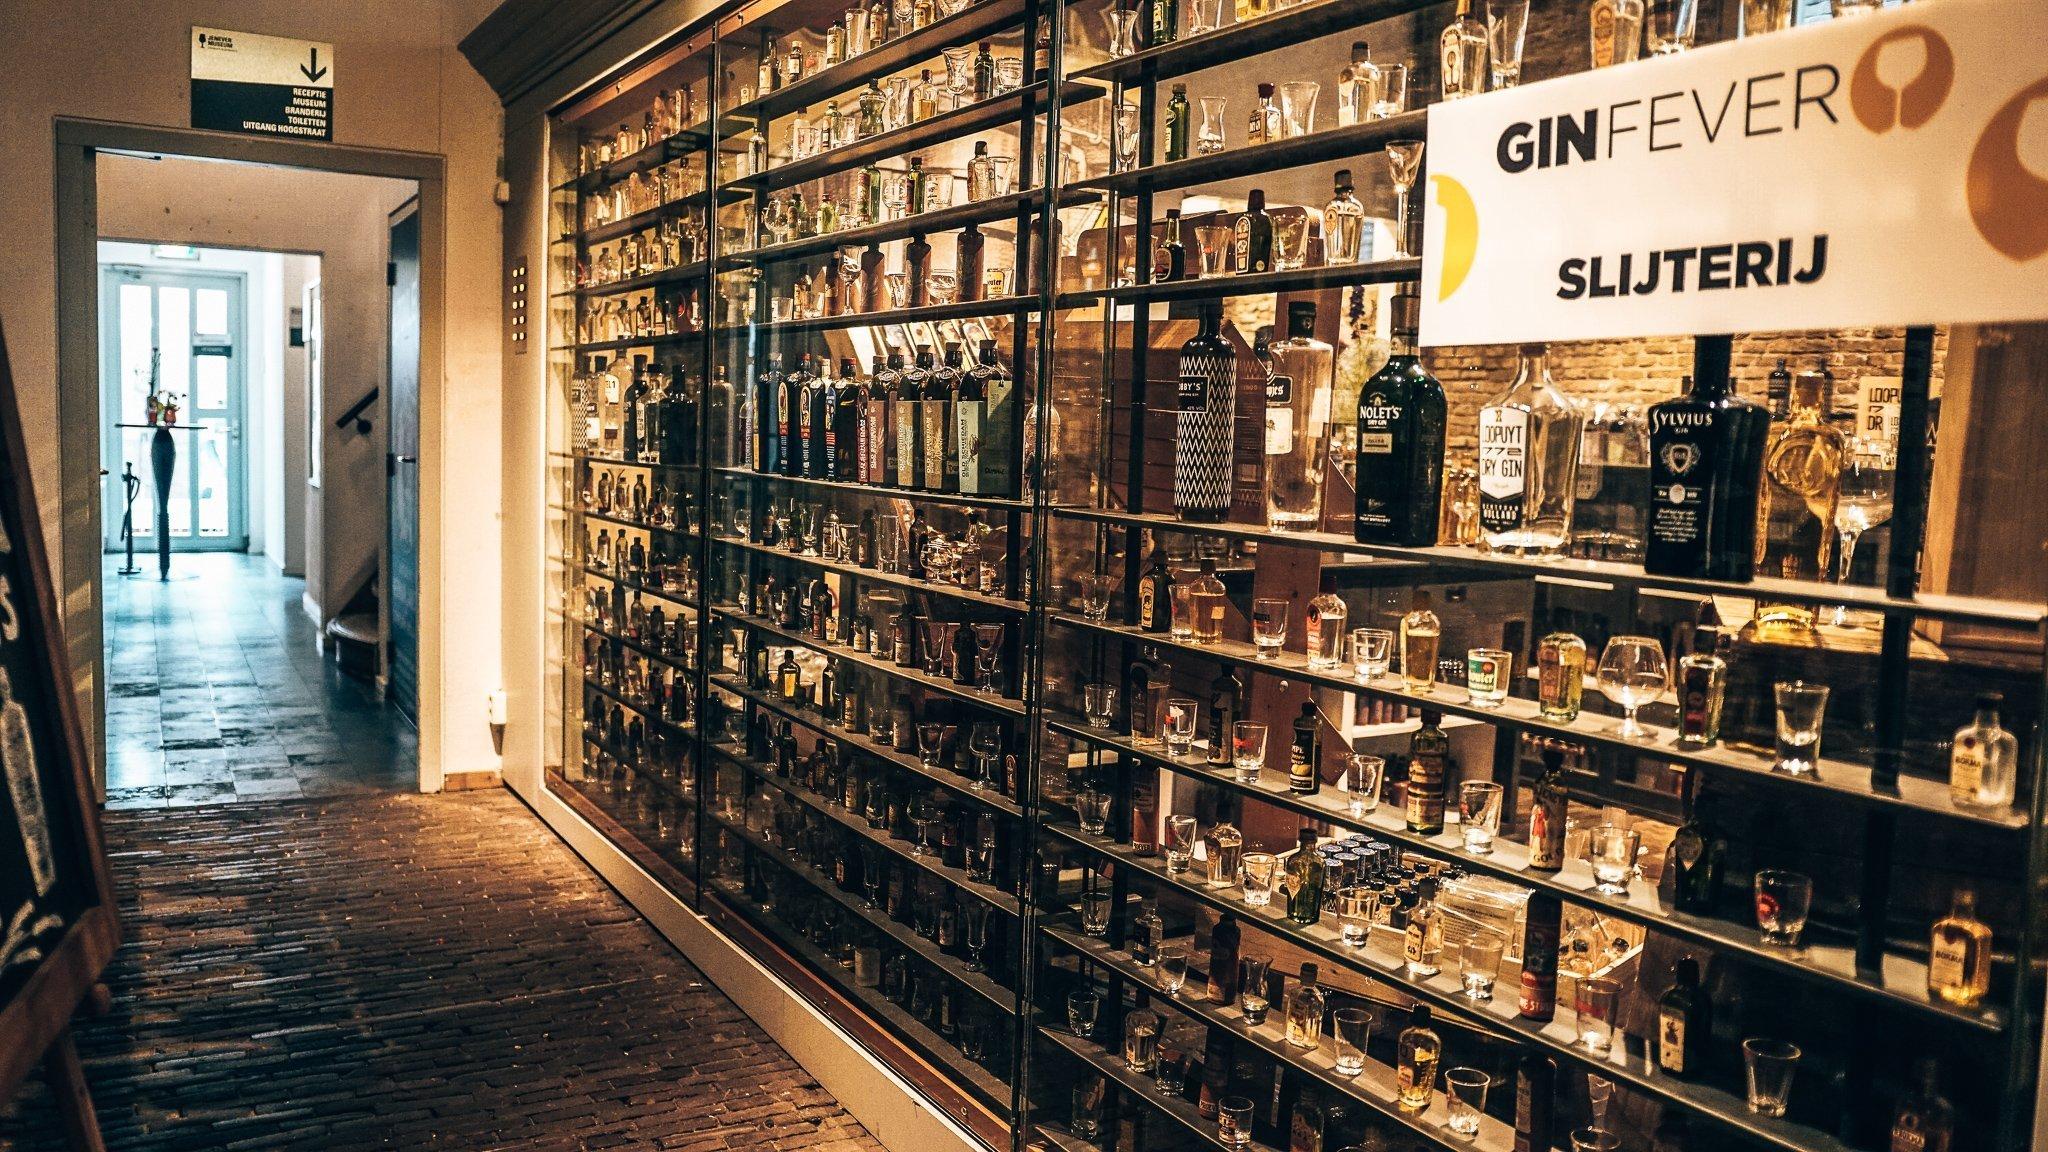 GinFever slijterij, Alles over gin.